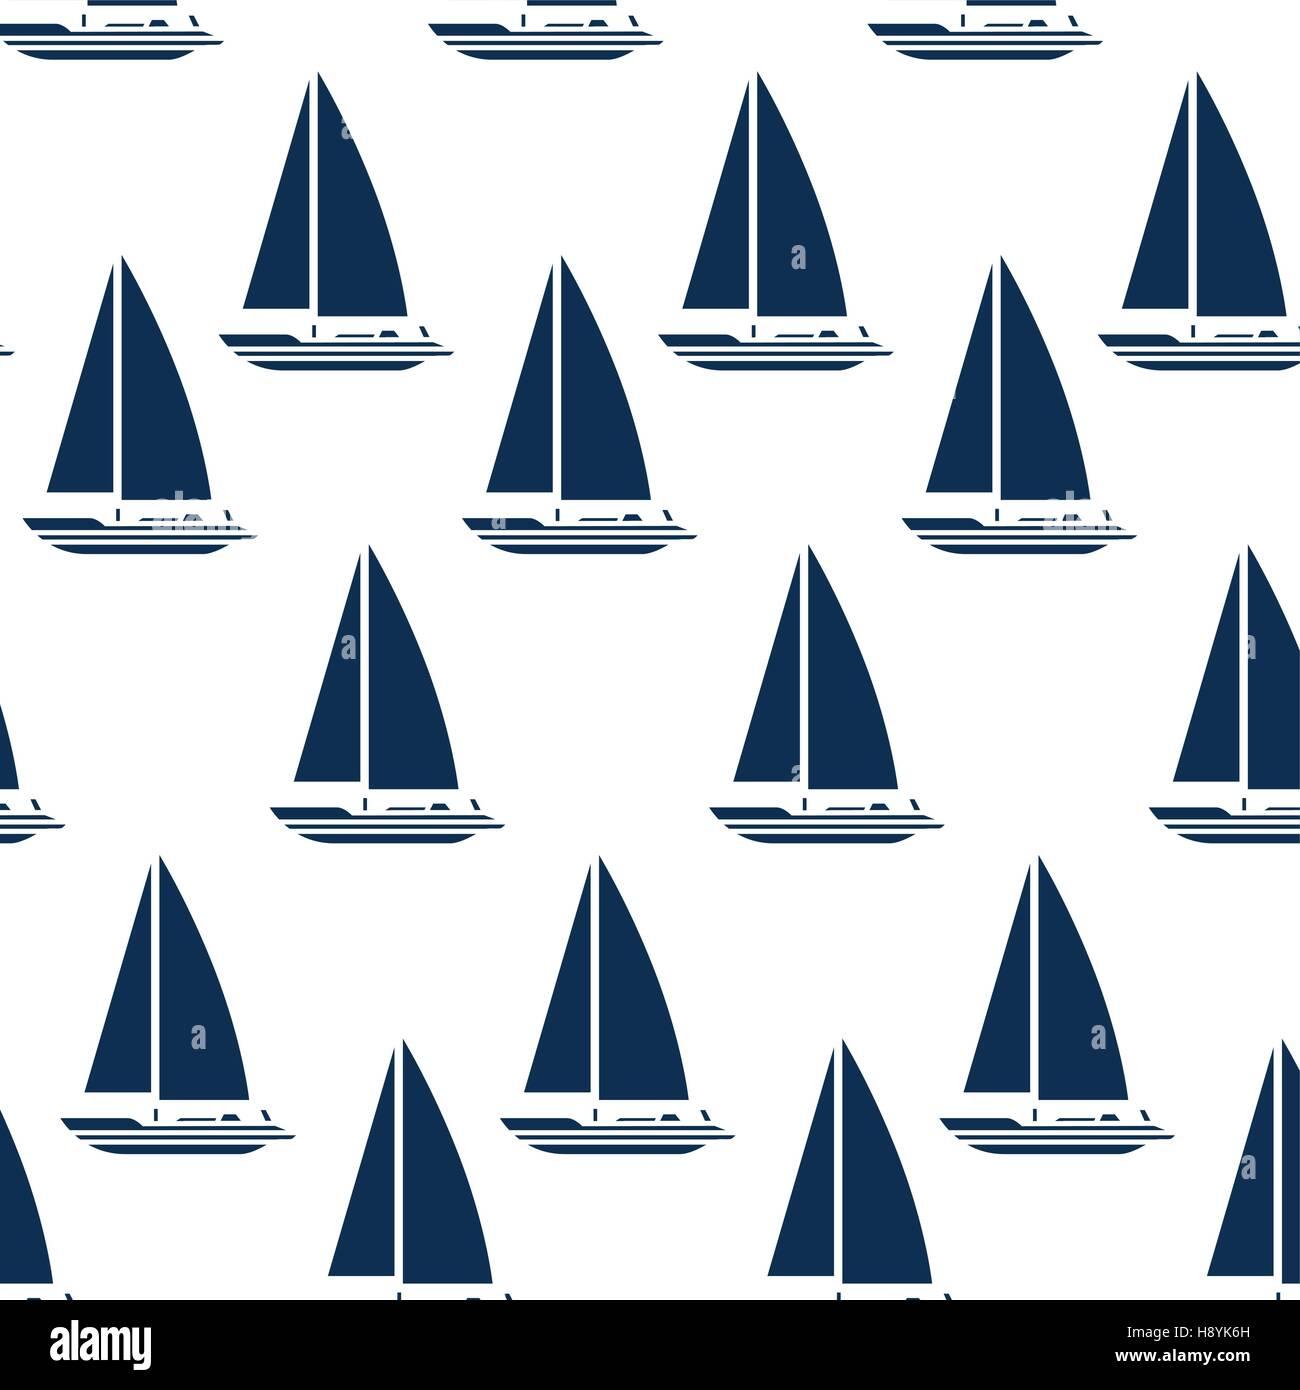 sailboat maritime frame icon vector illustration design - Stock Image